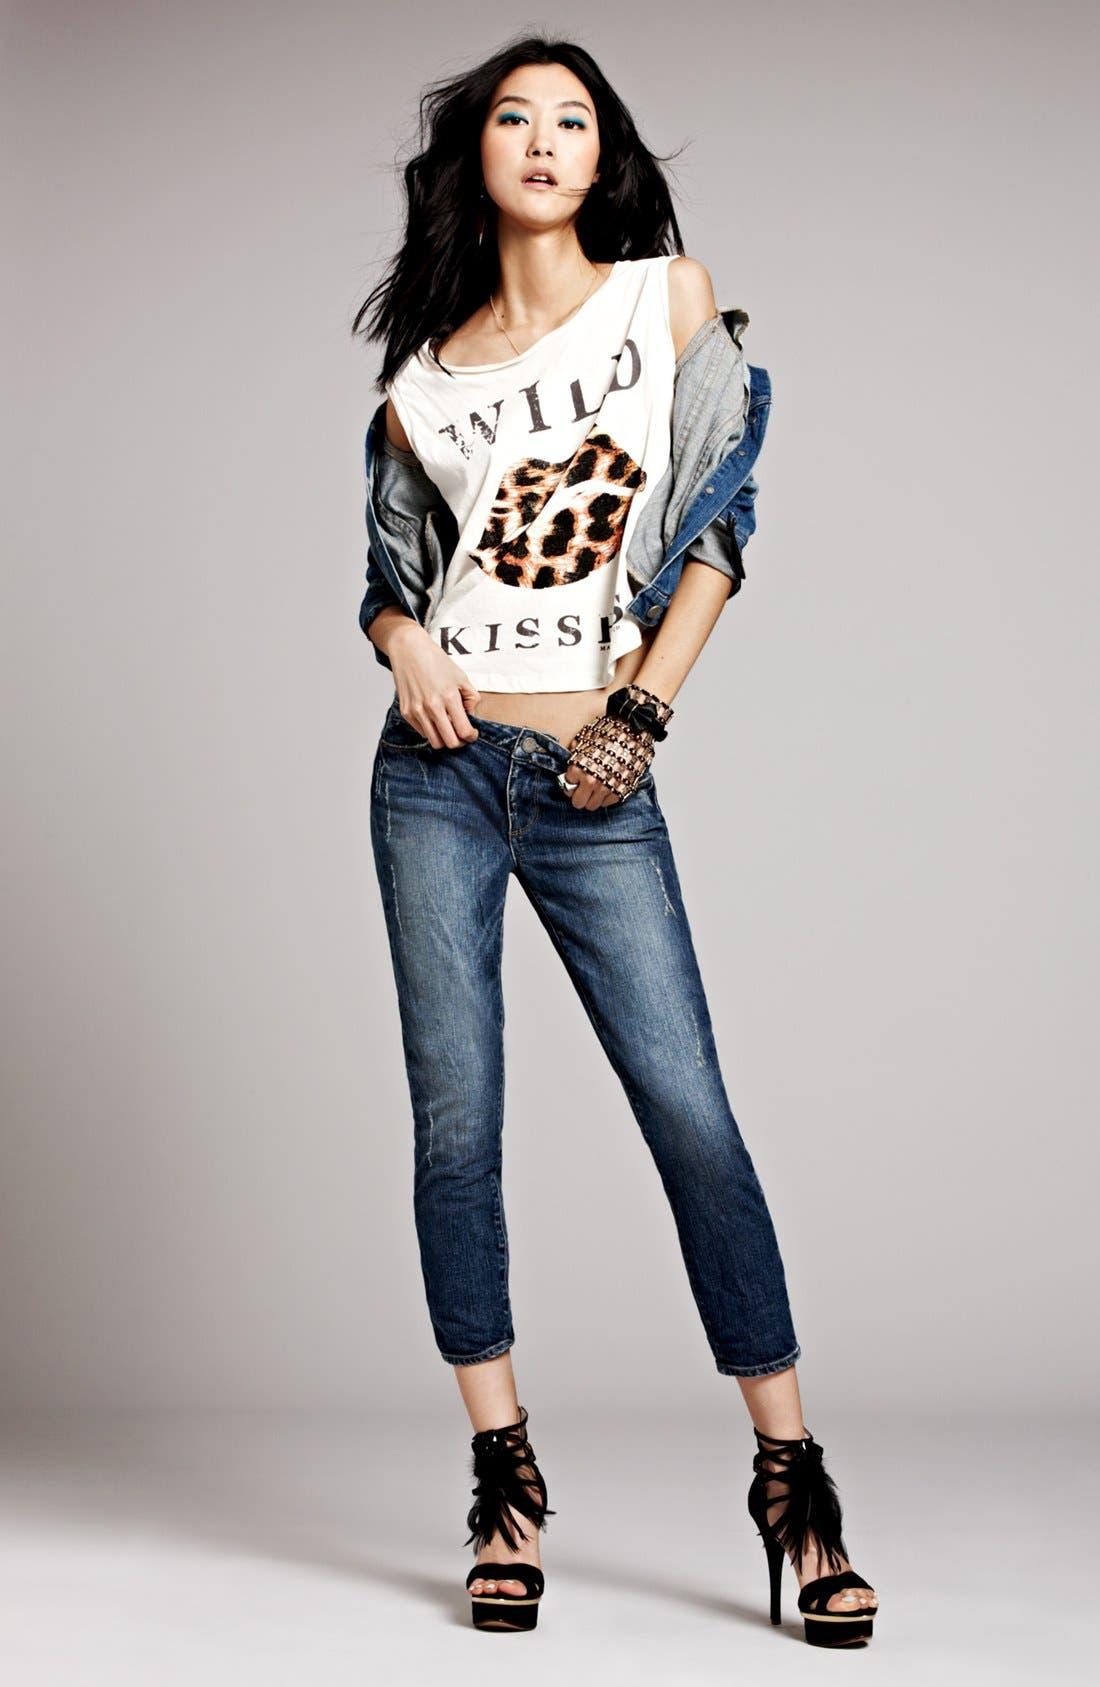 Main Image - Maison Scotch Tank, Paige Jeans & Jacket